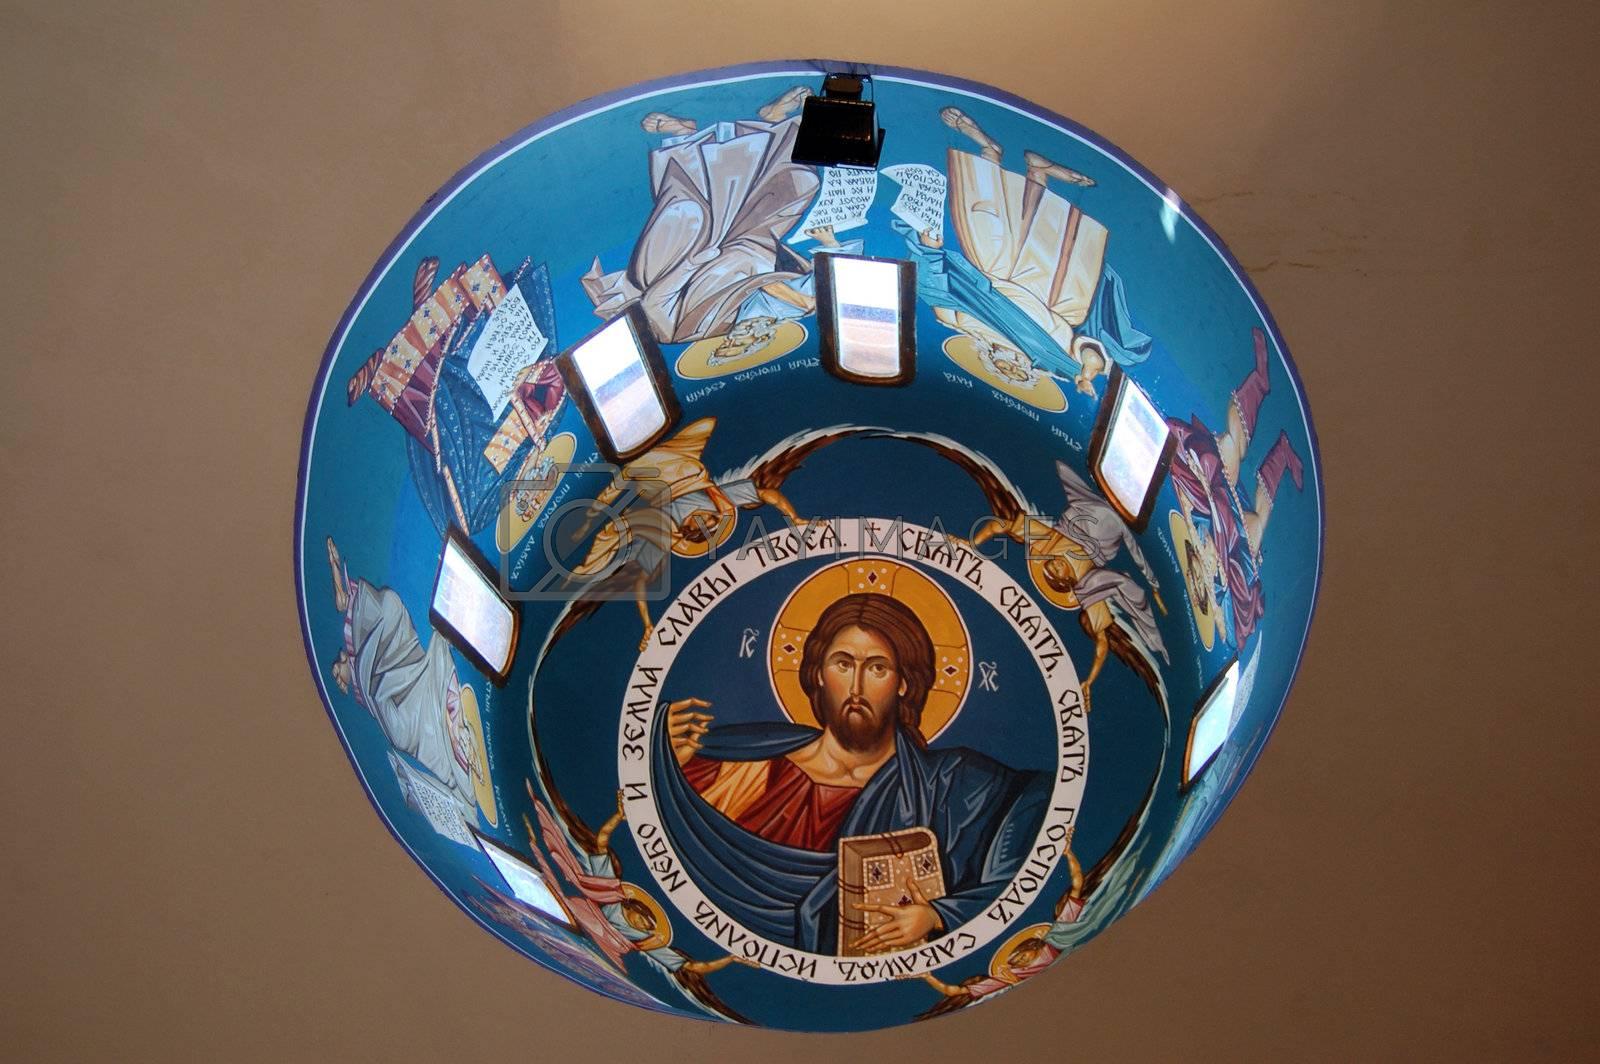 fresoe of jesus christ